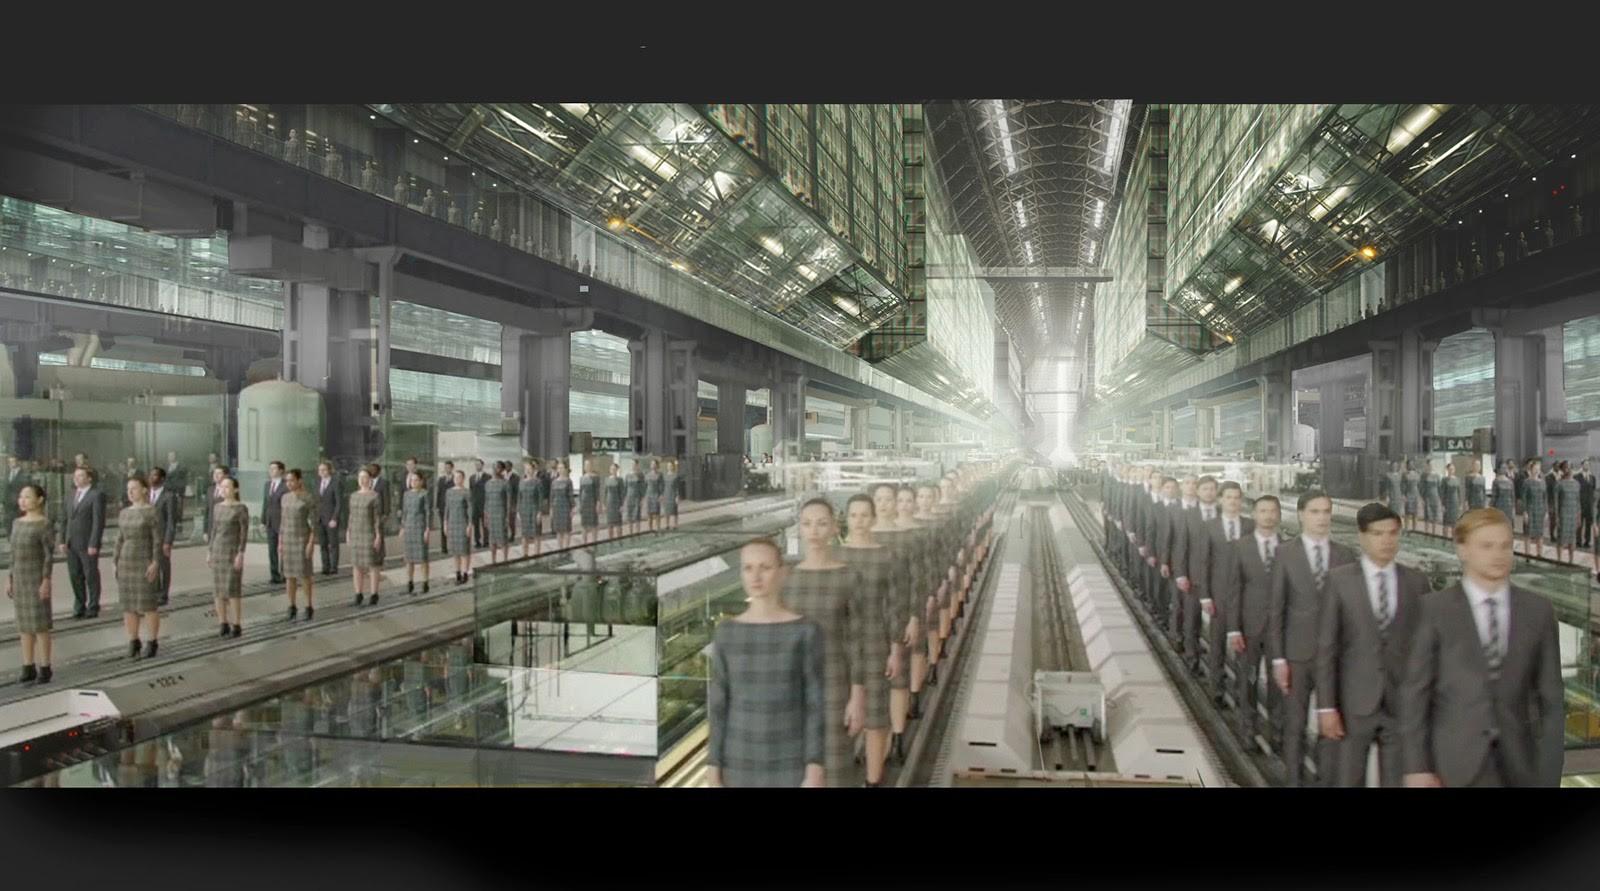 Infiniti Q50 - 'Factory of Life'